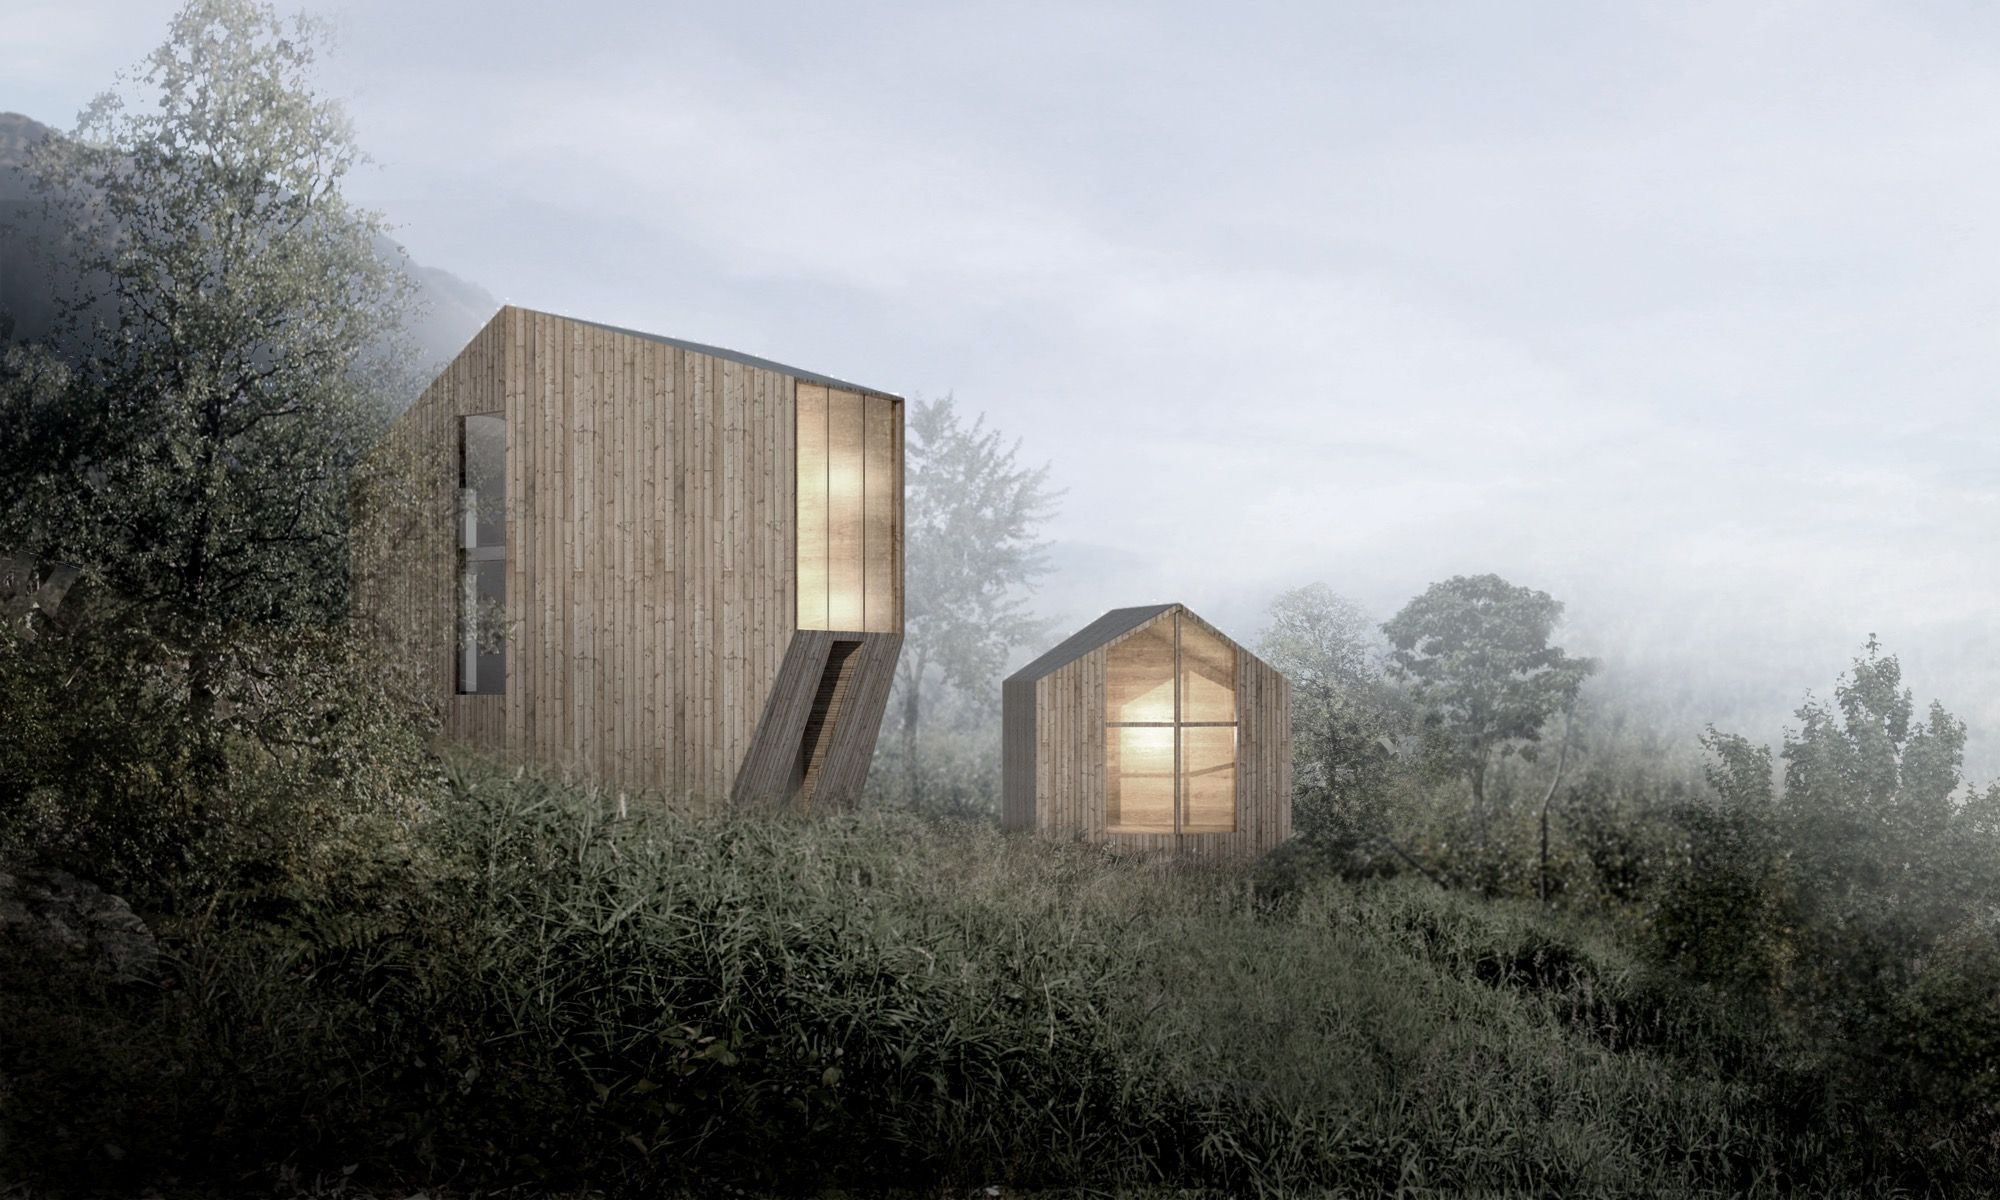 haus p allg u mountain home by studio yonder cabins i peterssen keller architecture pinterest. Black Bedroom Furniture Sets. Home Design Ideas